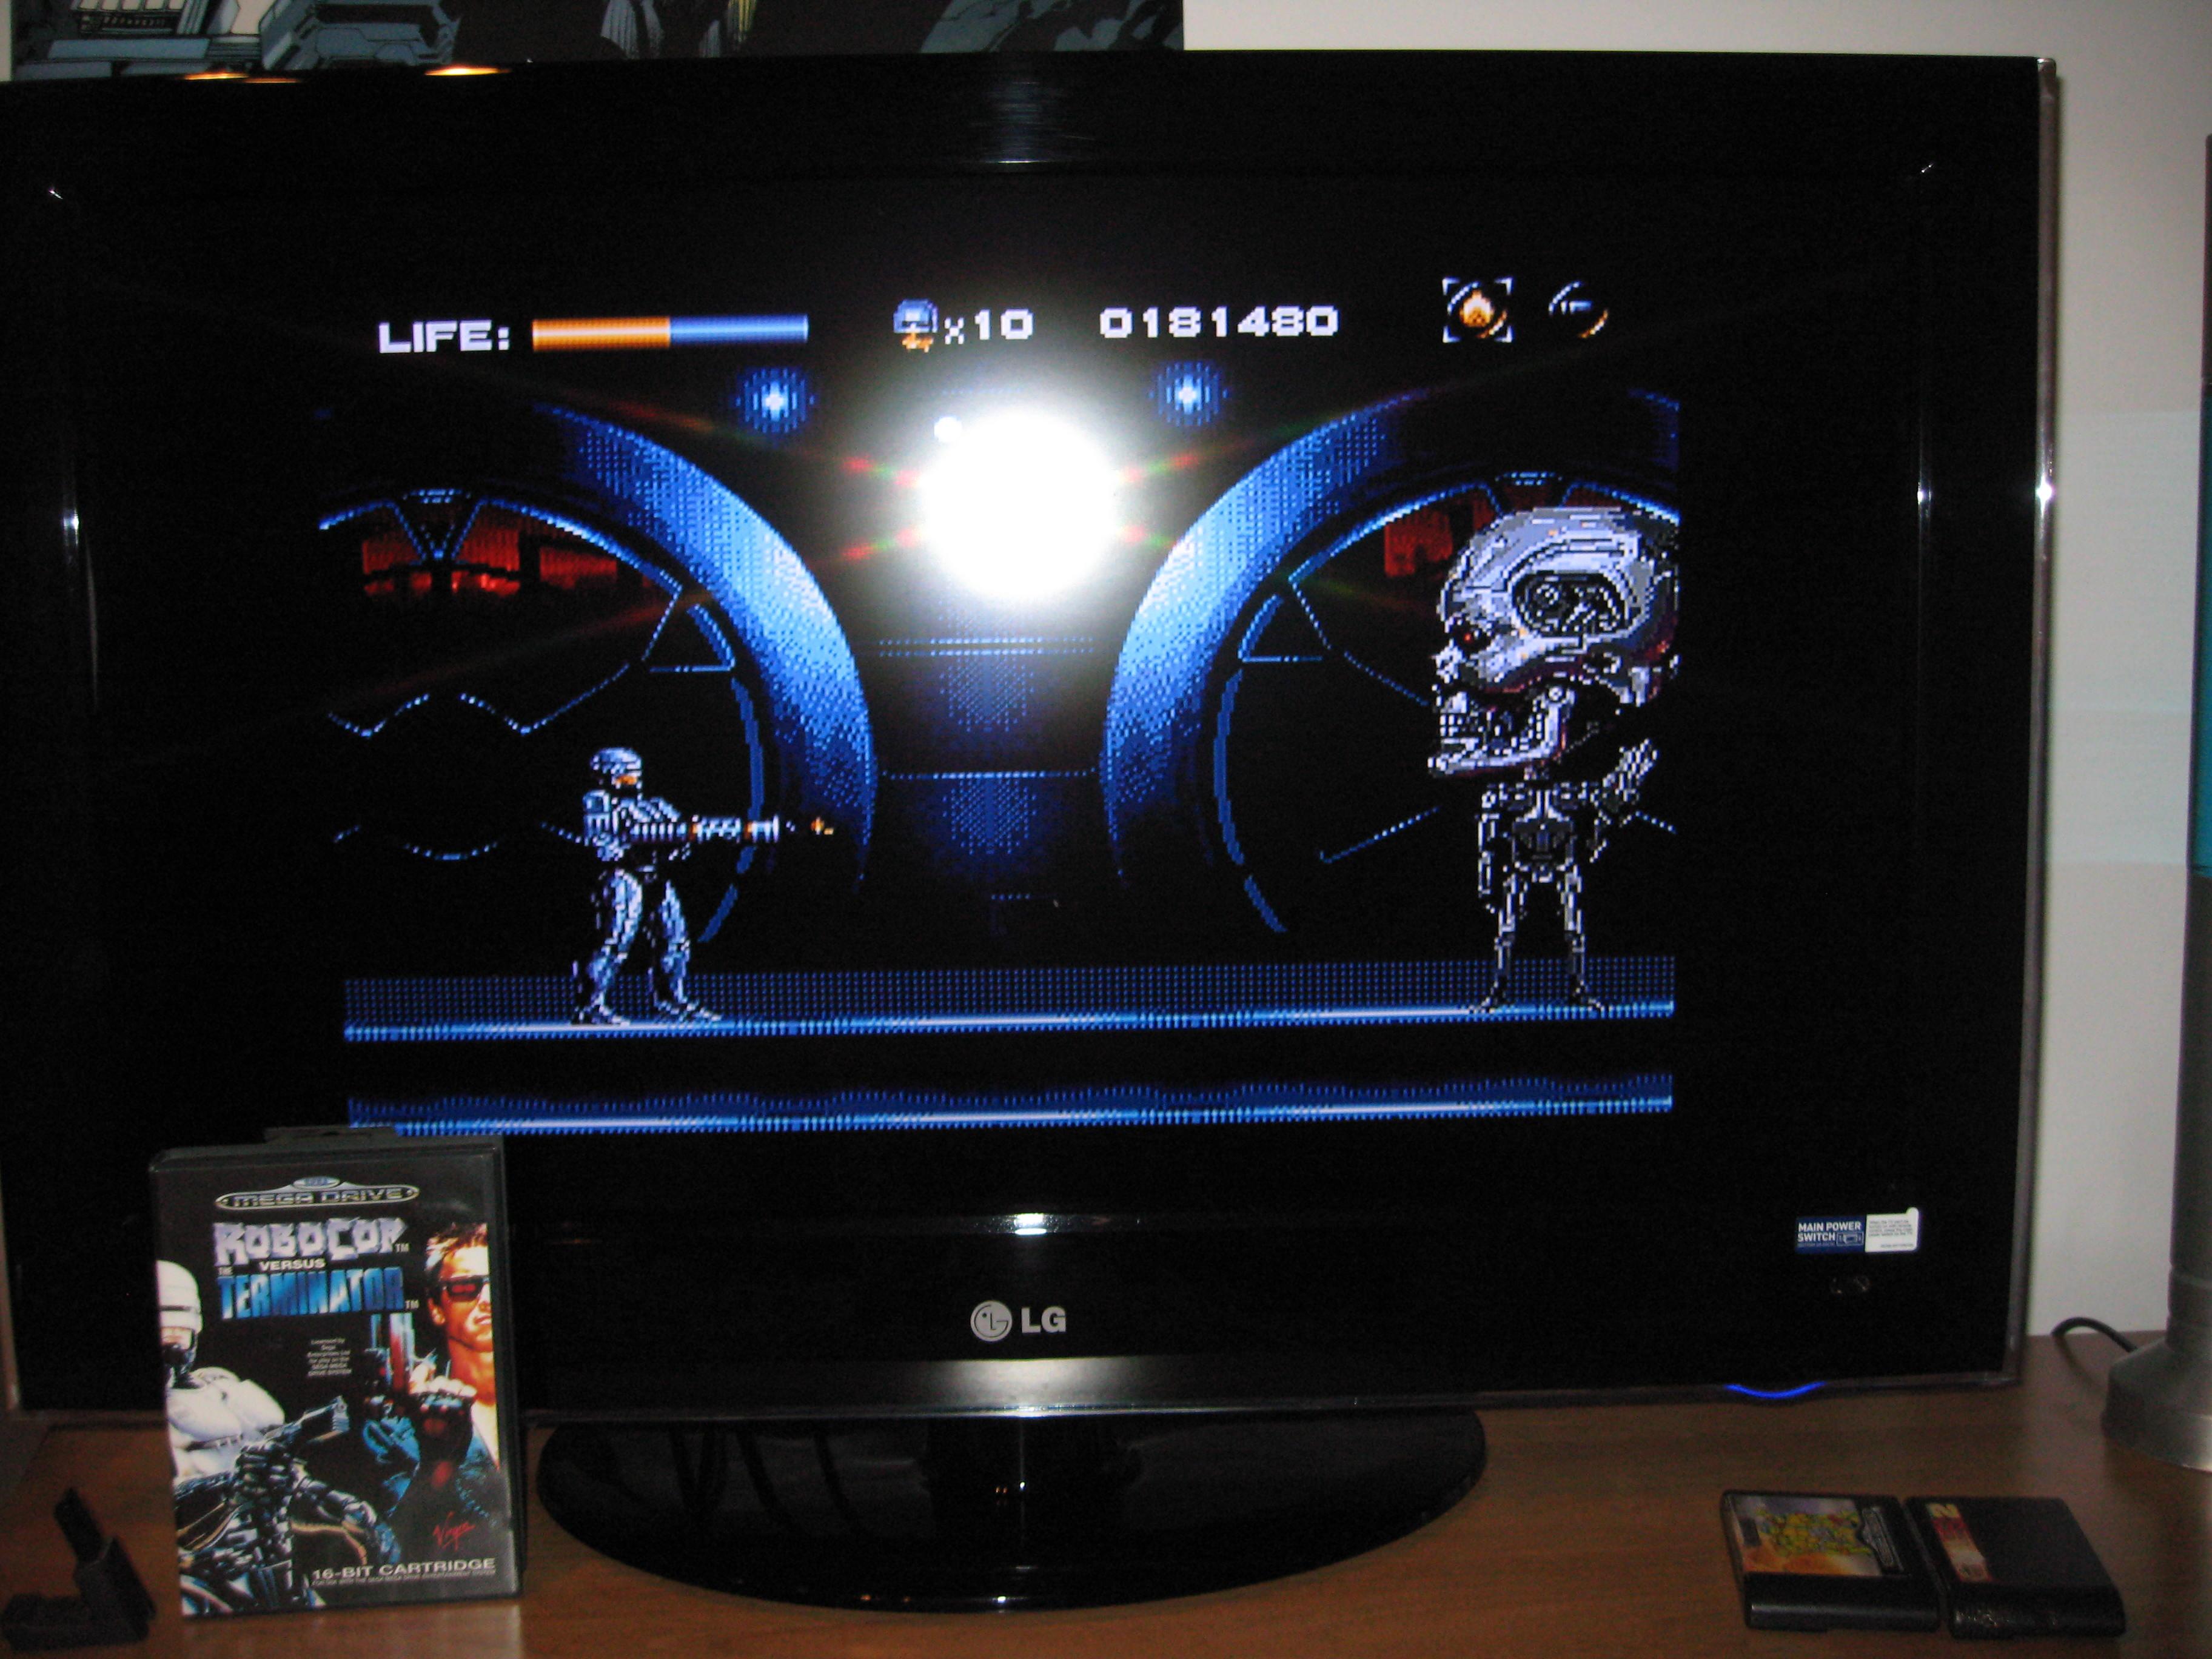 stika: Robocop Versus Terminator (Sega Genesis / MegaDrive) 181,480 points on 2014-12-04 16:53:04